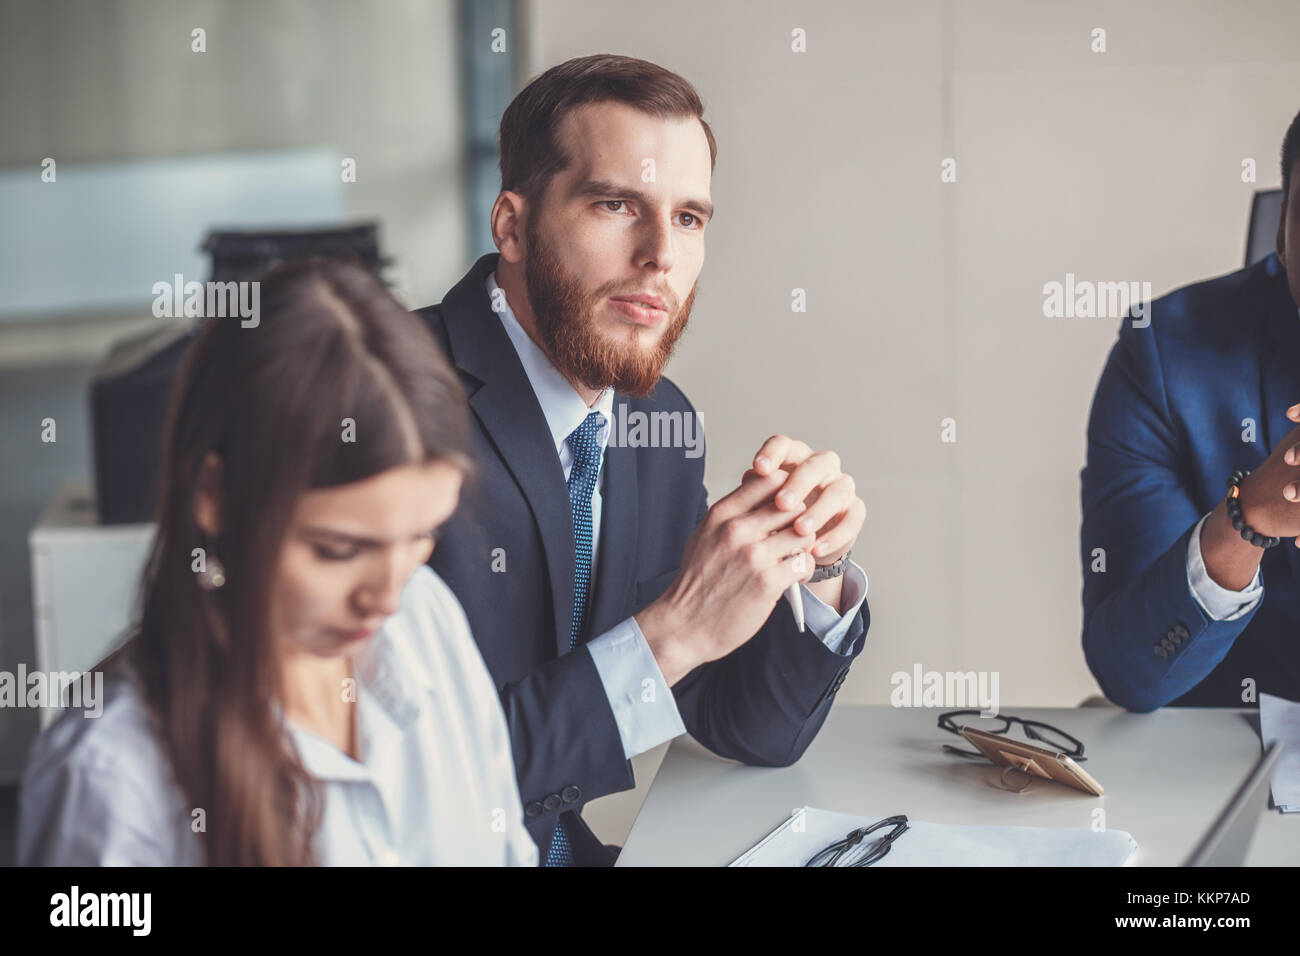 Team leader e business leader proprietario riunione informale in-house business meeting Immagini Stock